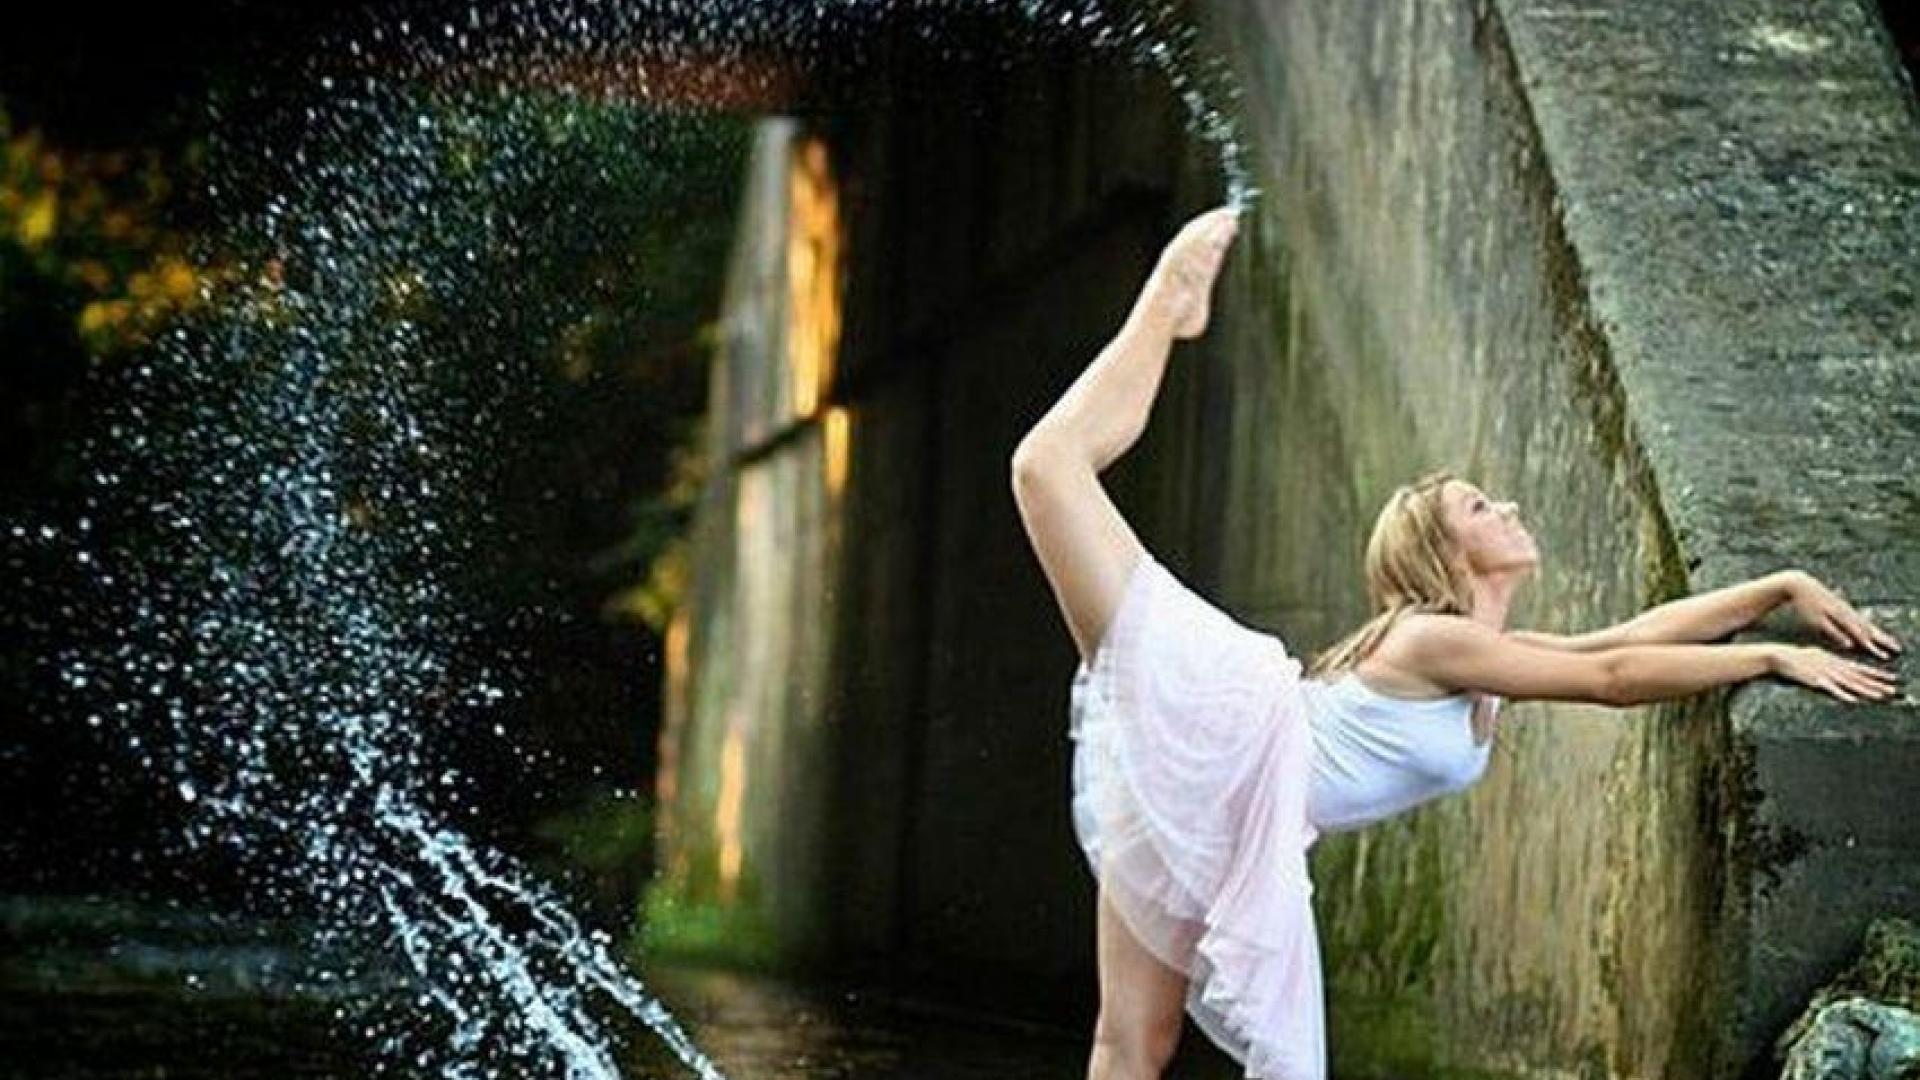 GIRL IN WATER WALLPAPER   44729   HD Wallpapers   [desktopinHQnet] 1920x1080